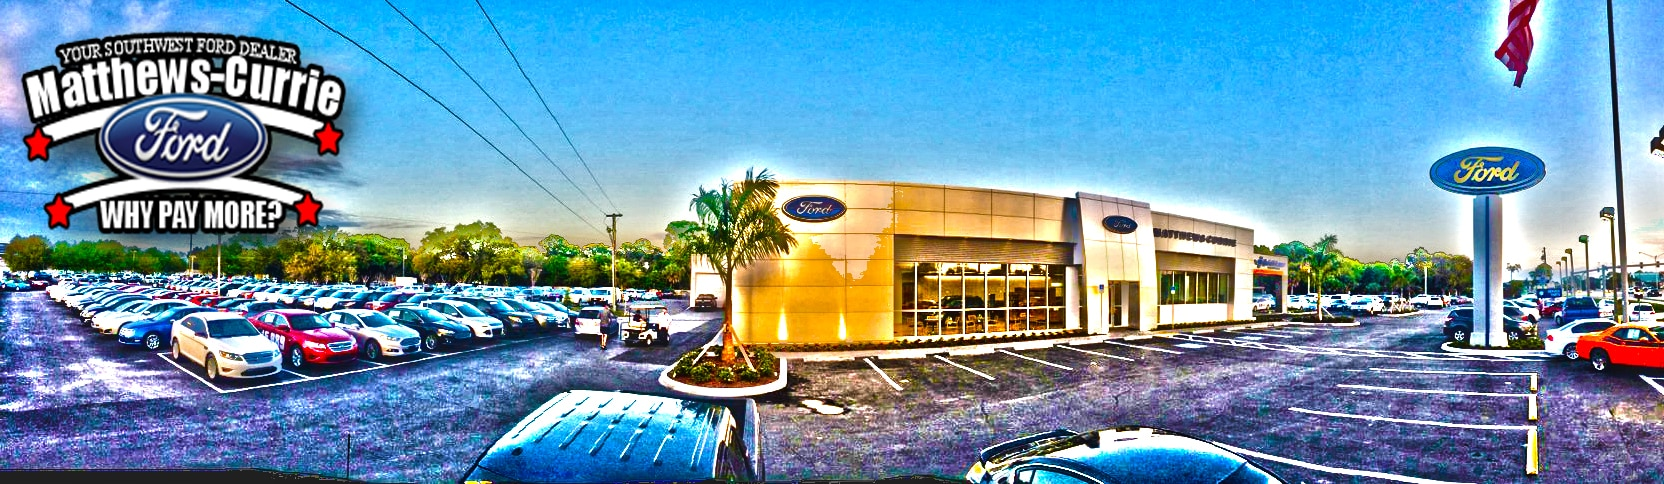 Matthews Currie Ford Nokomis Fl Ford Dealers Sarasota